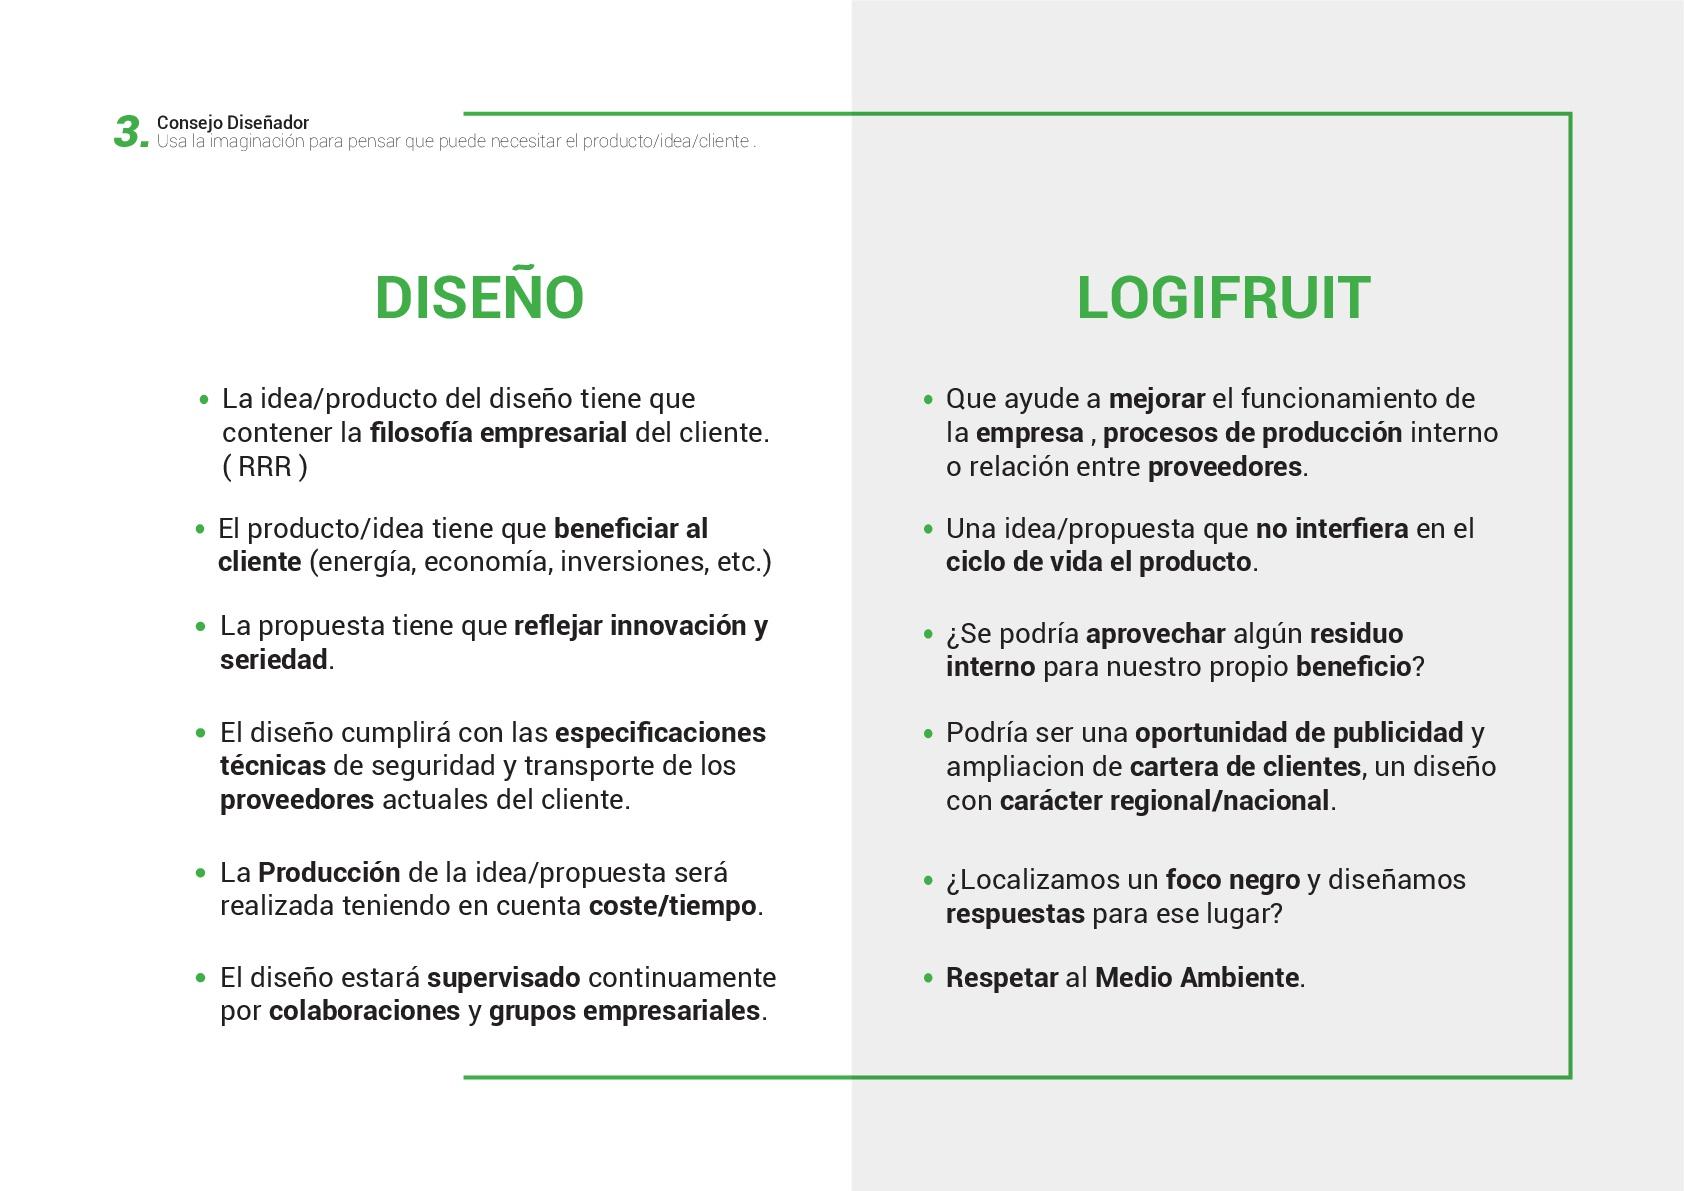 PROPUESTA-LOGIFRUIT-013